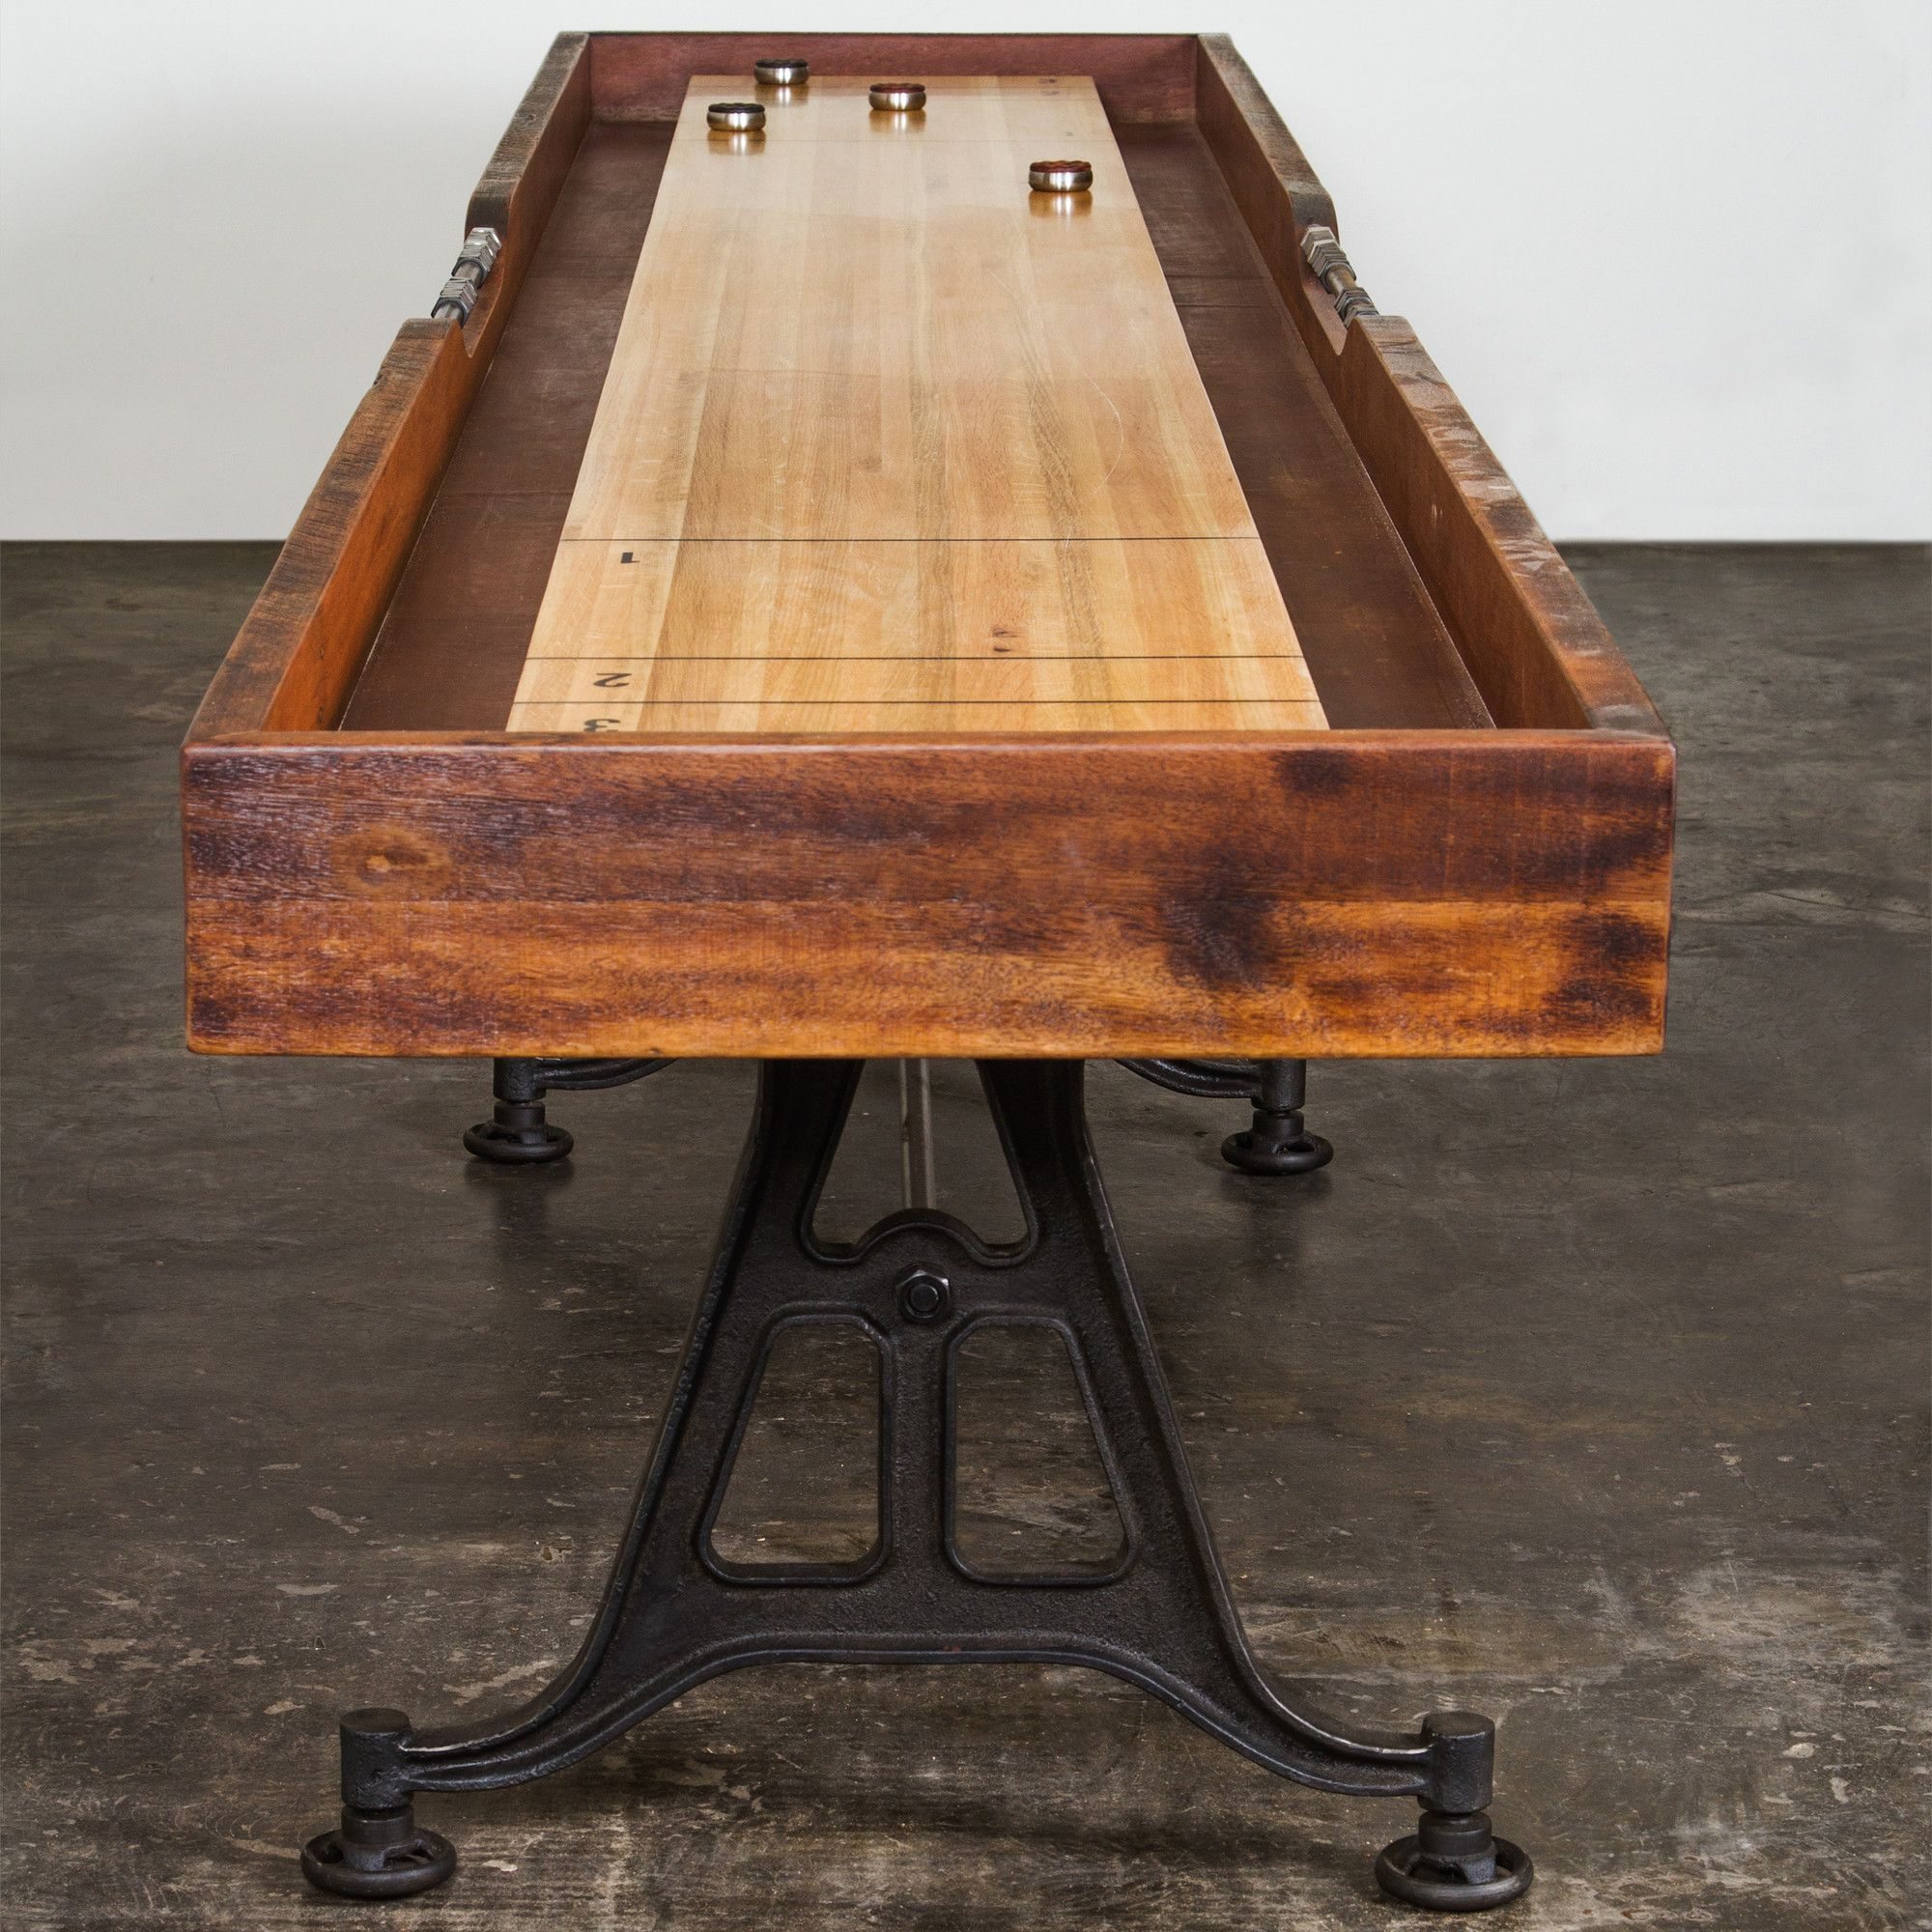 District Eight 12 Shuffleboard Table In 2020 Shuffleboard Table